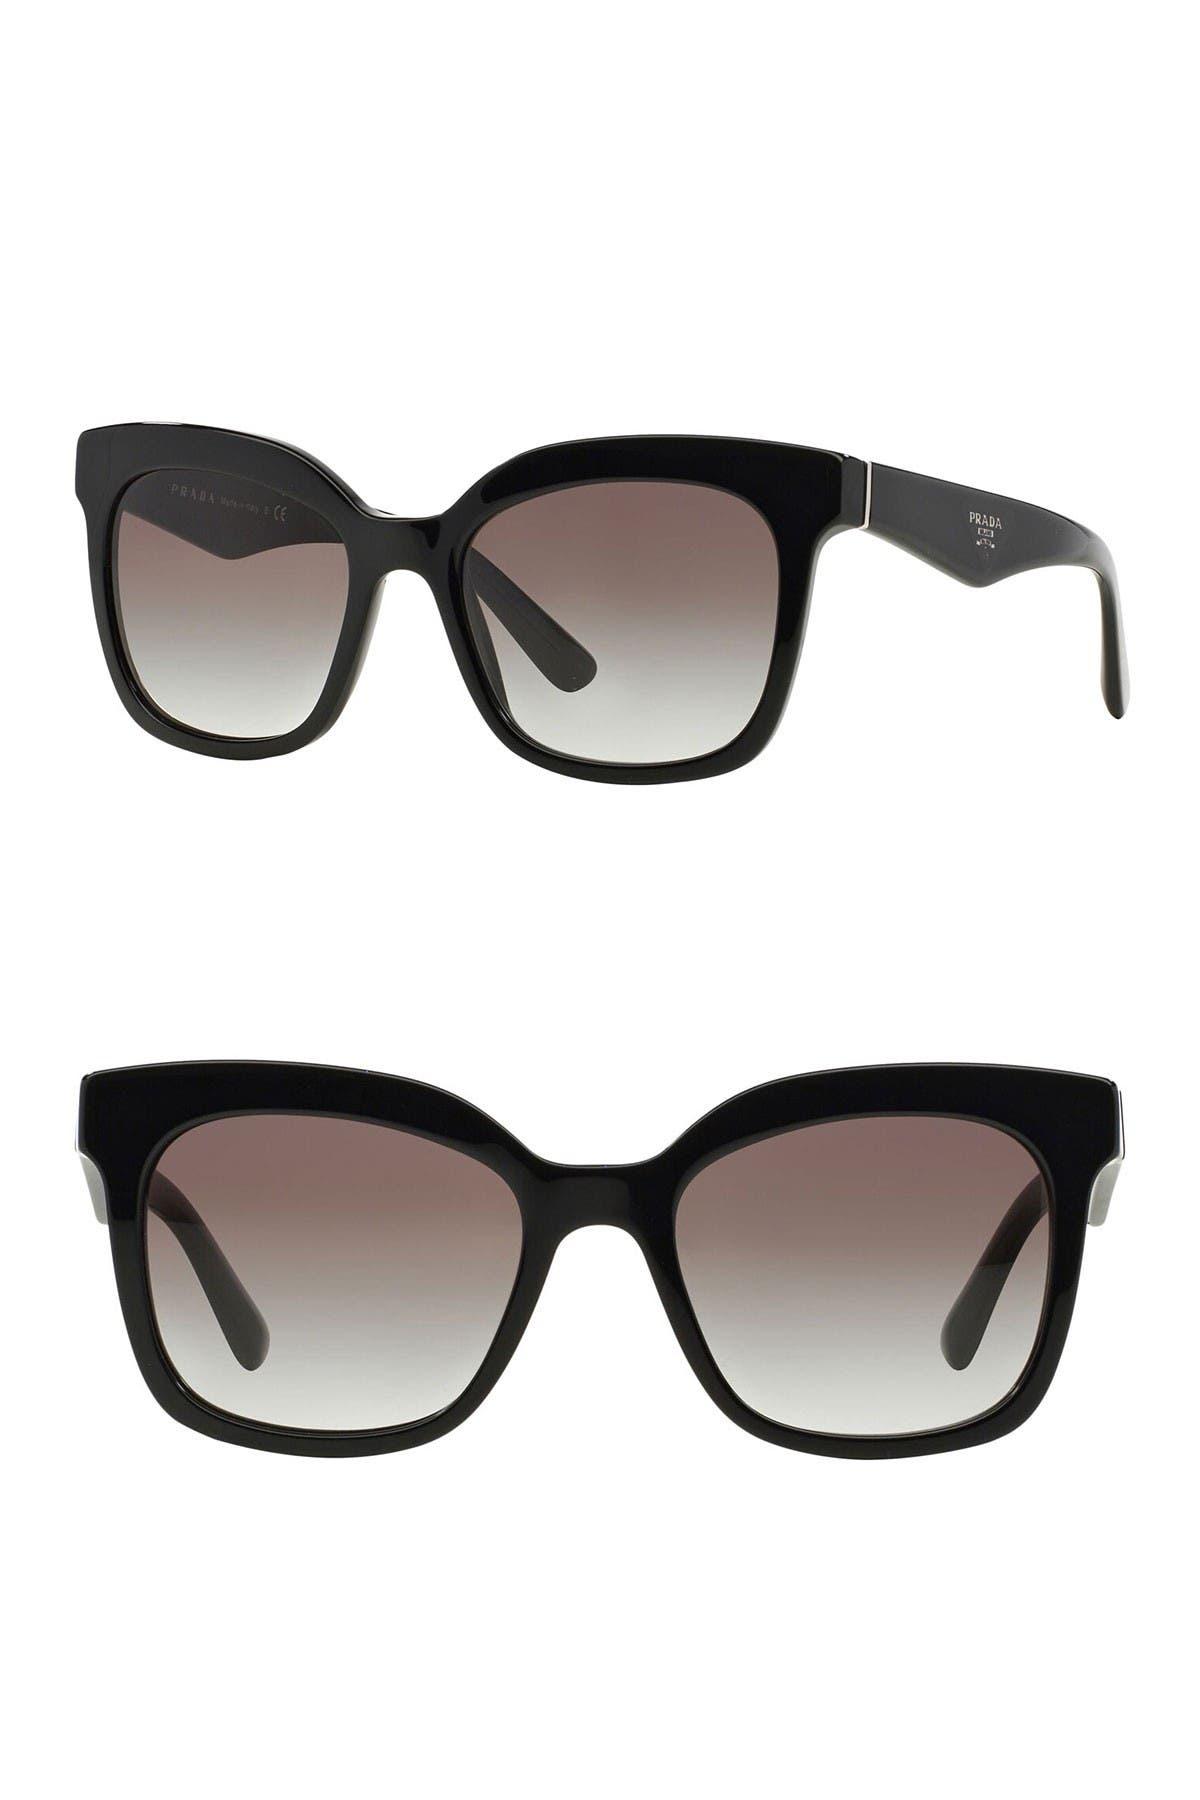 Image of Prada Heritage 53mm Square Sunglasses